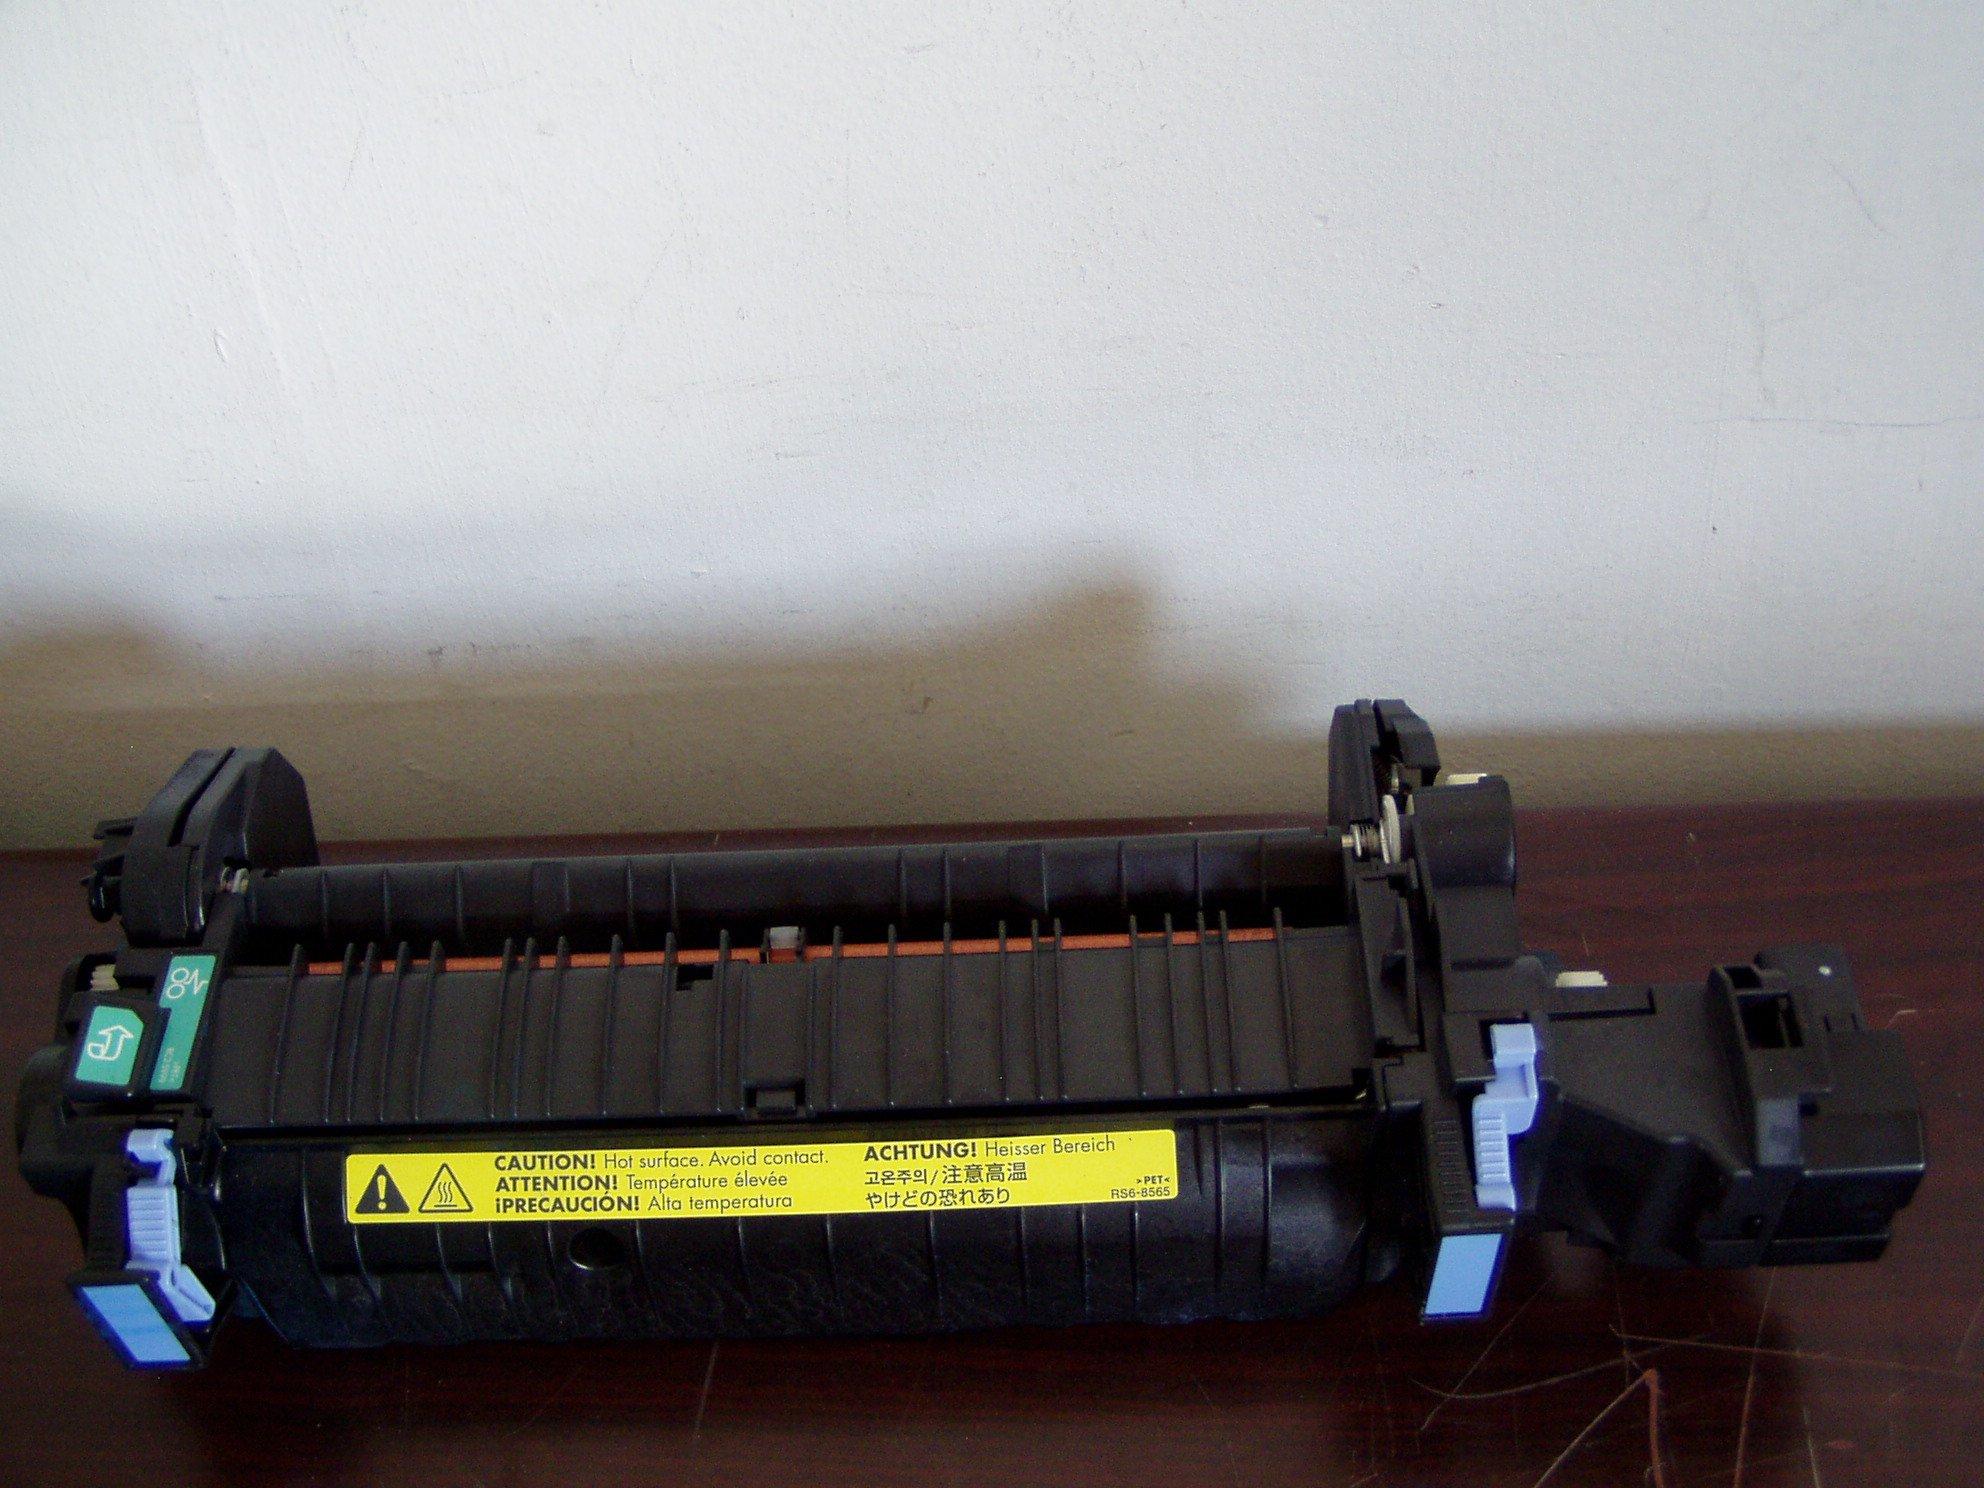 HP RM1-5554 RM1-5550 CE246A Fuser Unit for HP CP4025, CP4525, CM4540 Printers